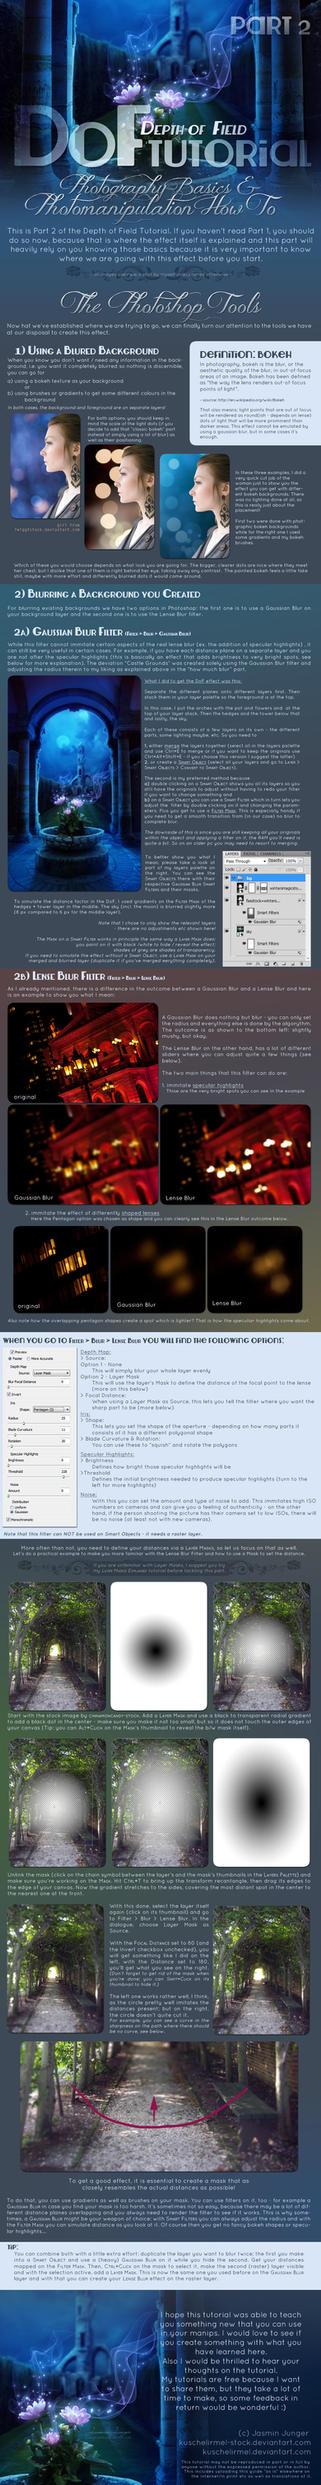 Depth of Field Photomanipulation Tutorial Part 2 by kuschelirmel-stock